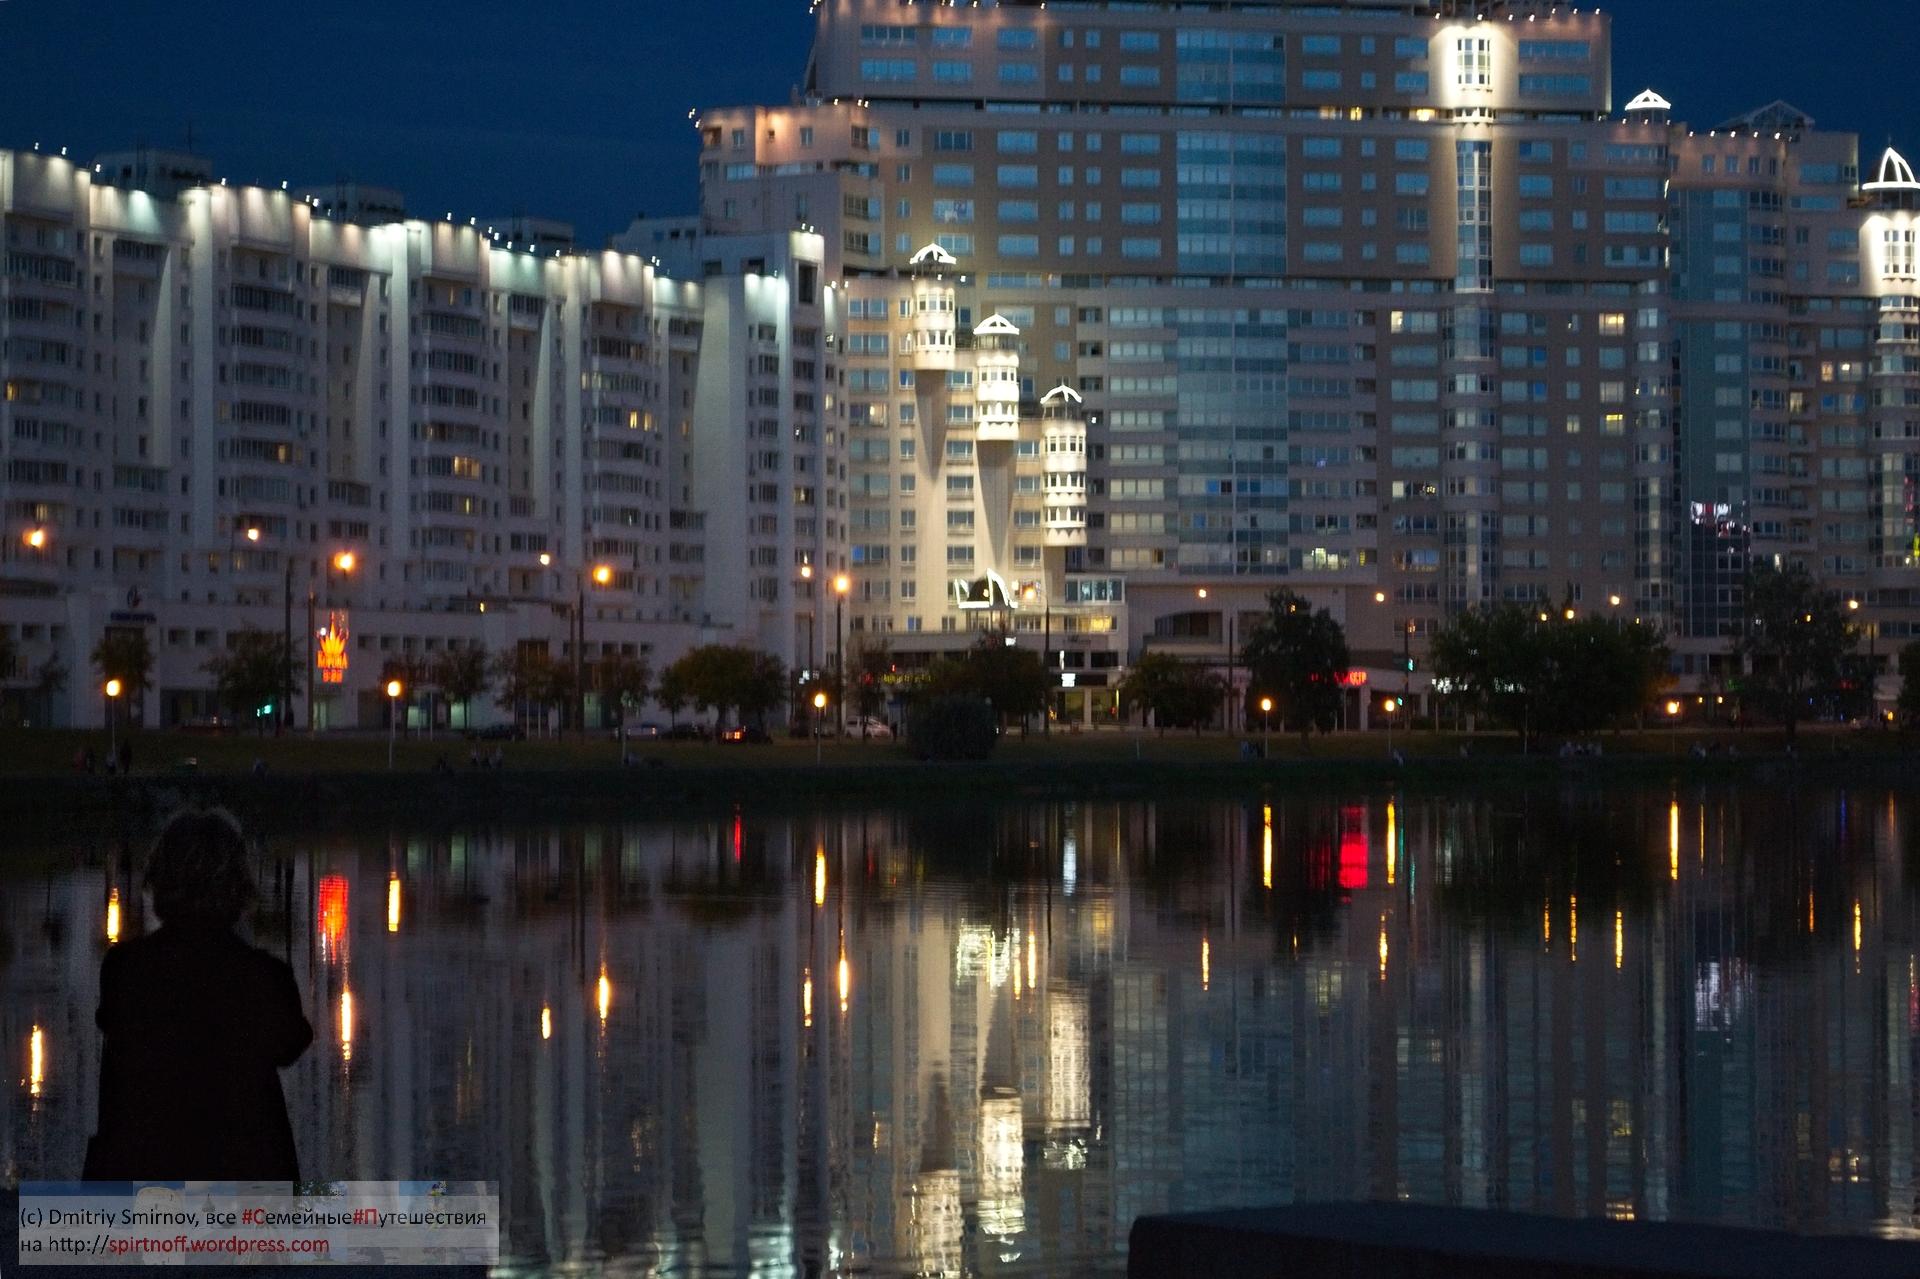 DSC_7335-30-Blog-14 Путешествия  Минск. Закат и город